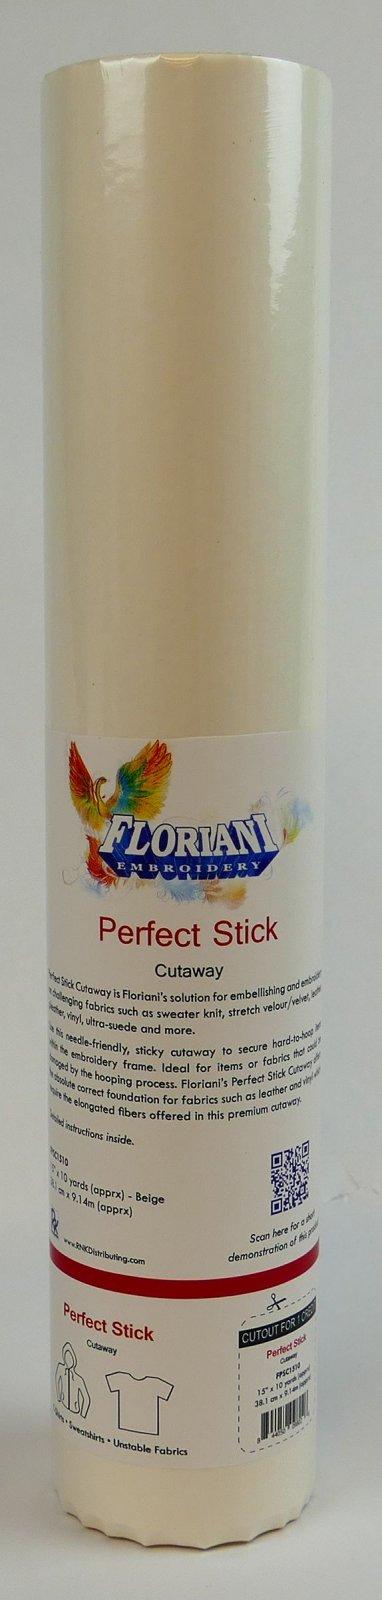 Floriani Perfect Stick Cutaway15 x 10 yards